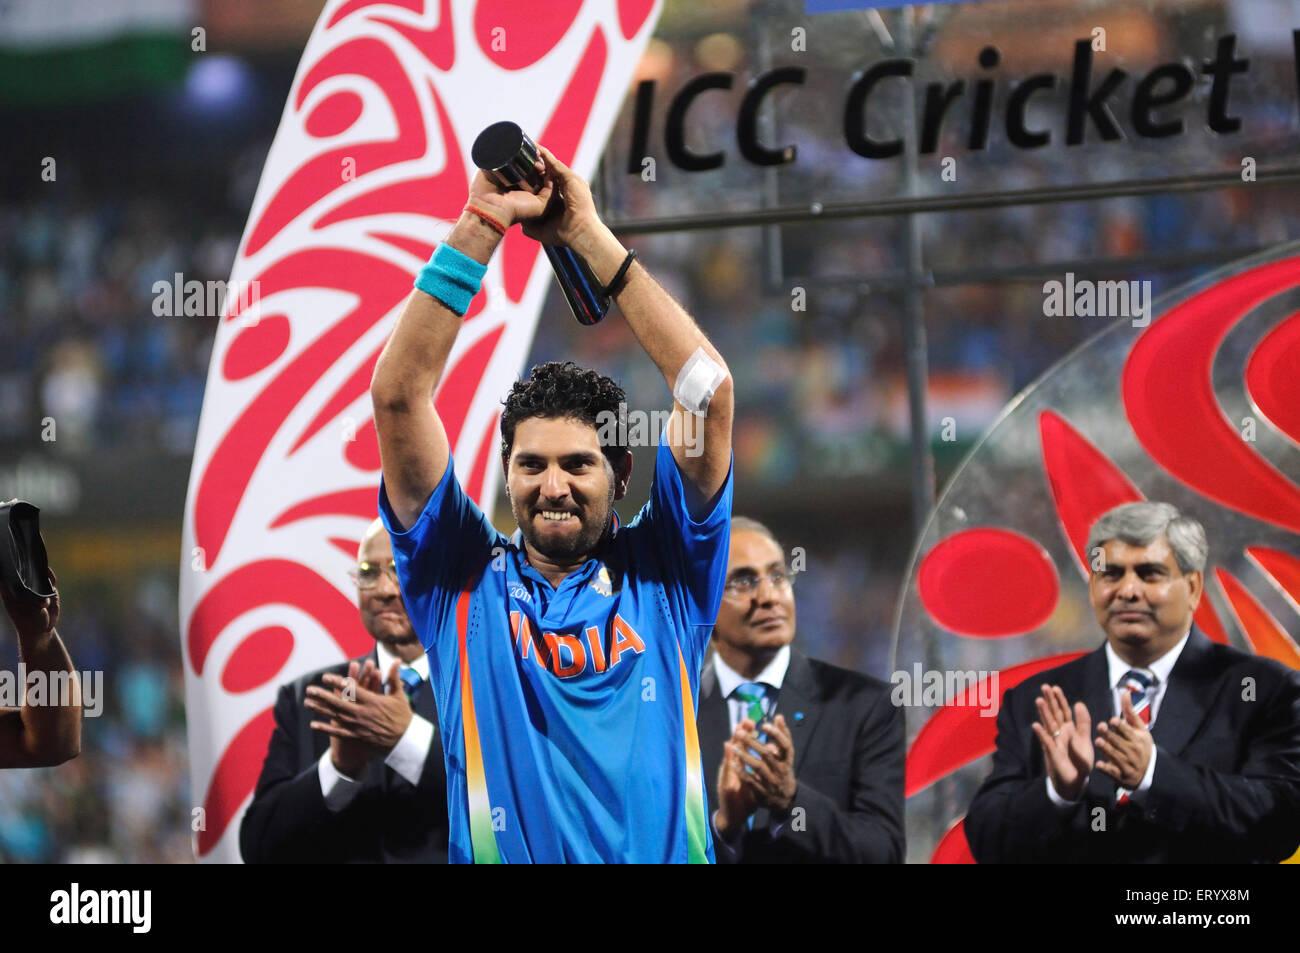 cricketer Yuvraj Singh receiving Man Tournament trophy Lanka ICC Cricket World Cup 2011 final played Wankhede Stadium - Stock Image